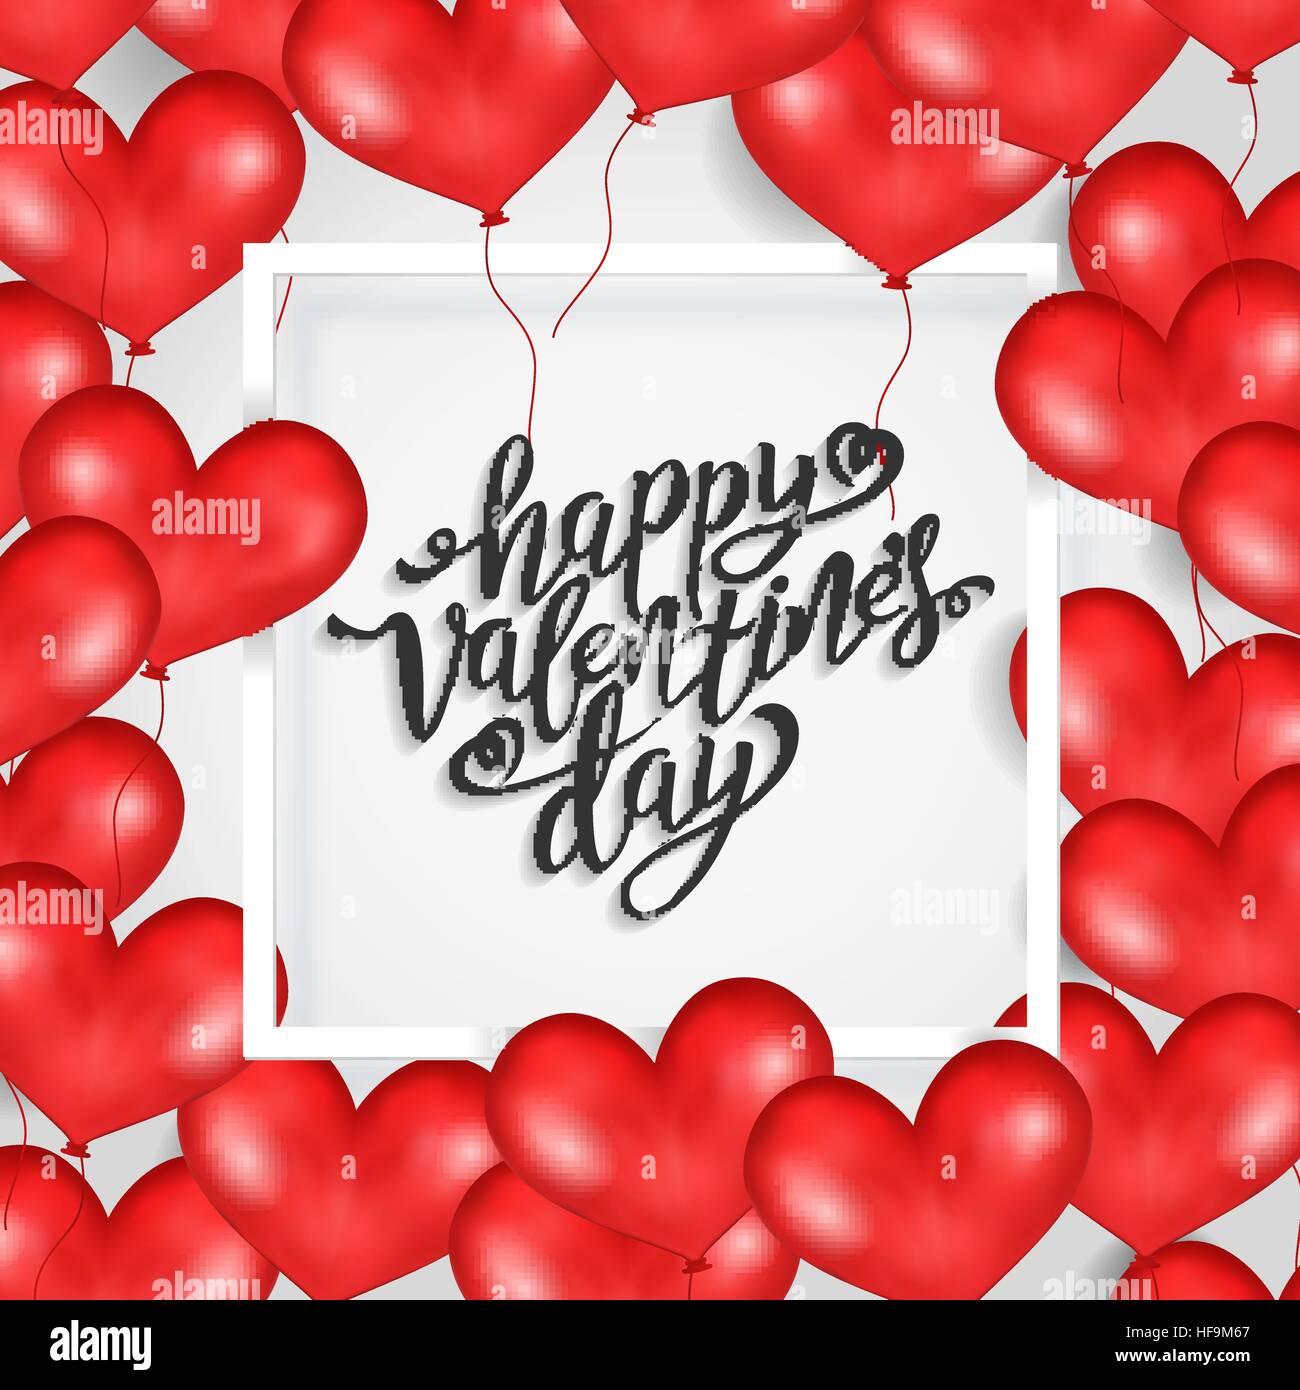 Happy Valentine s Day White Frame Red Heart Balloons White